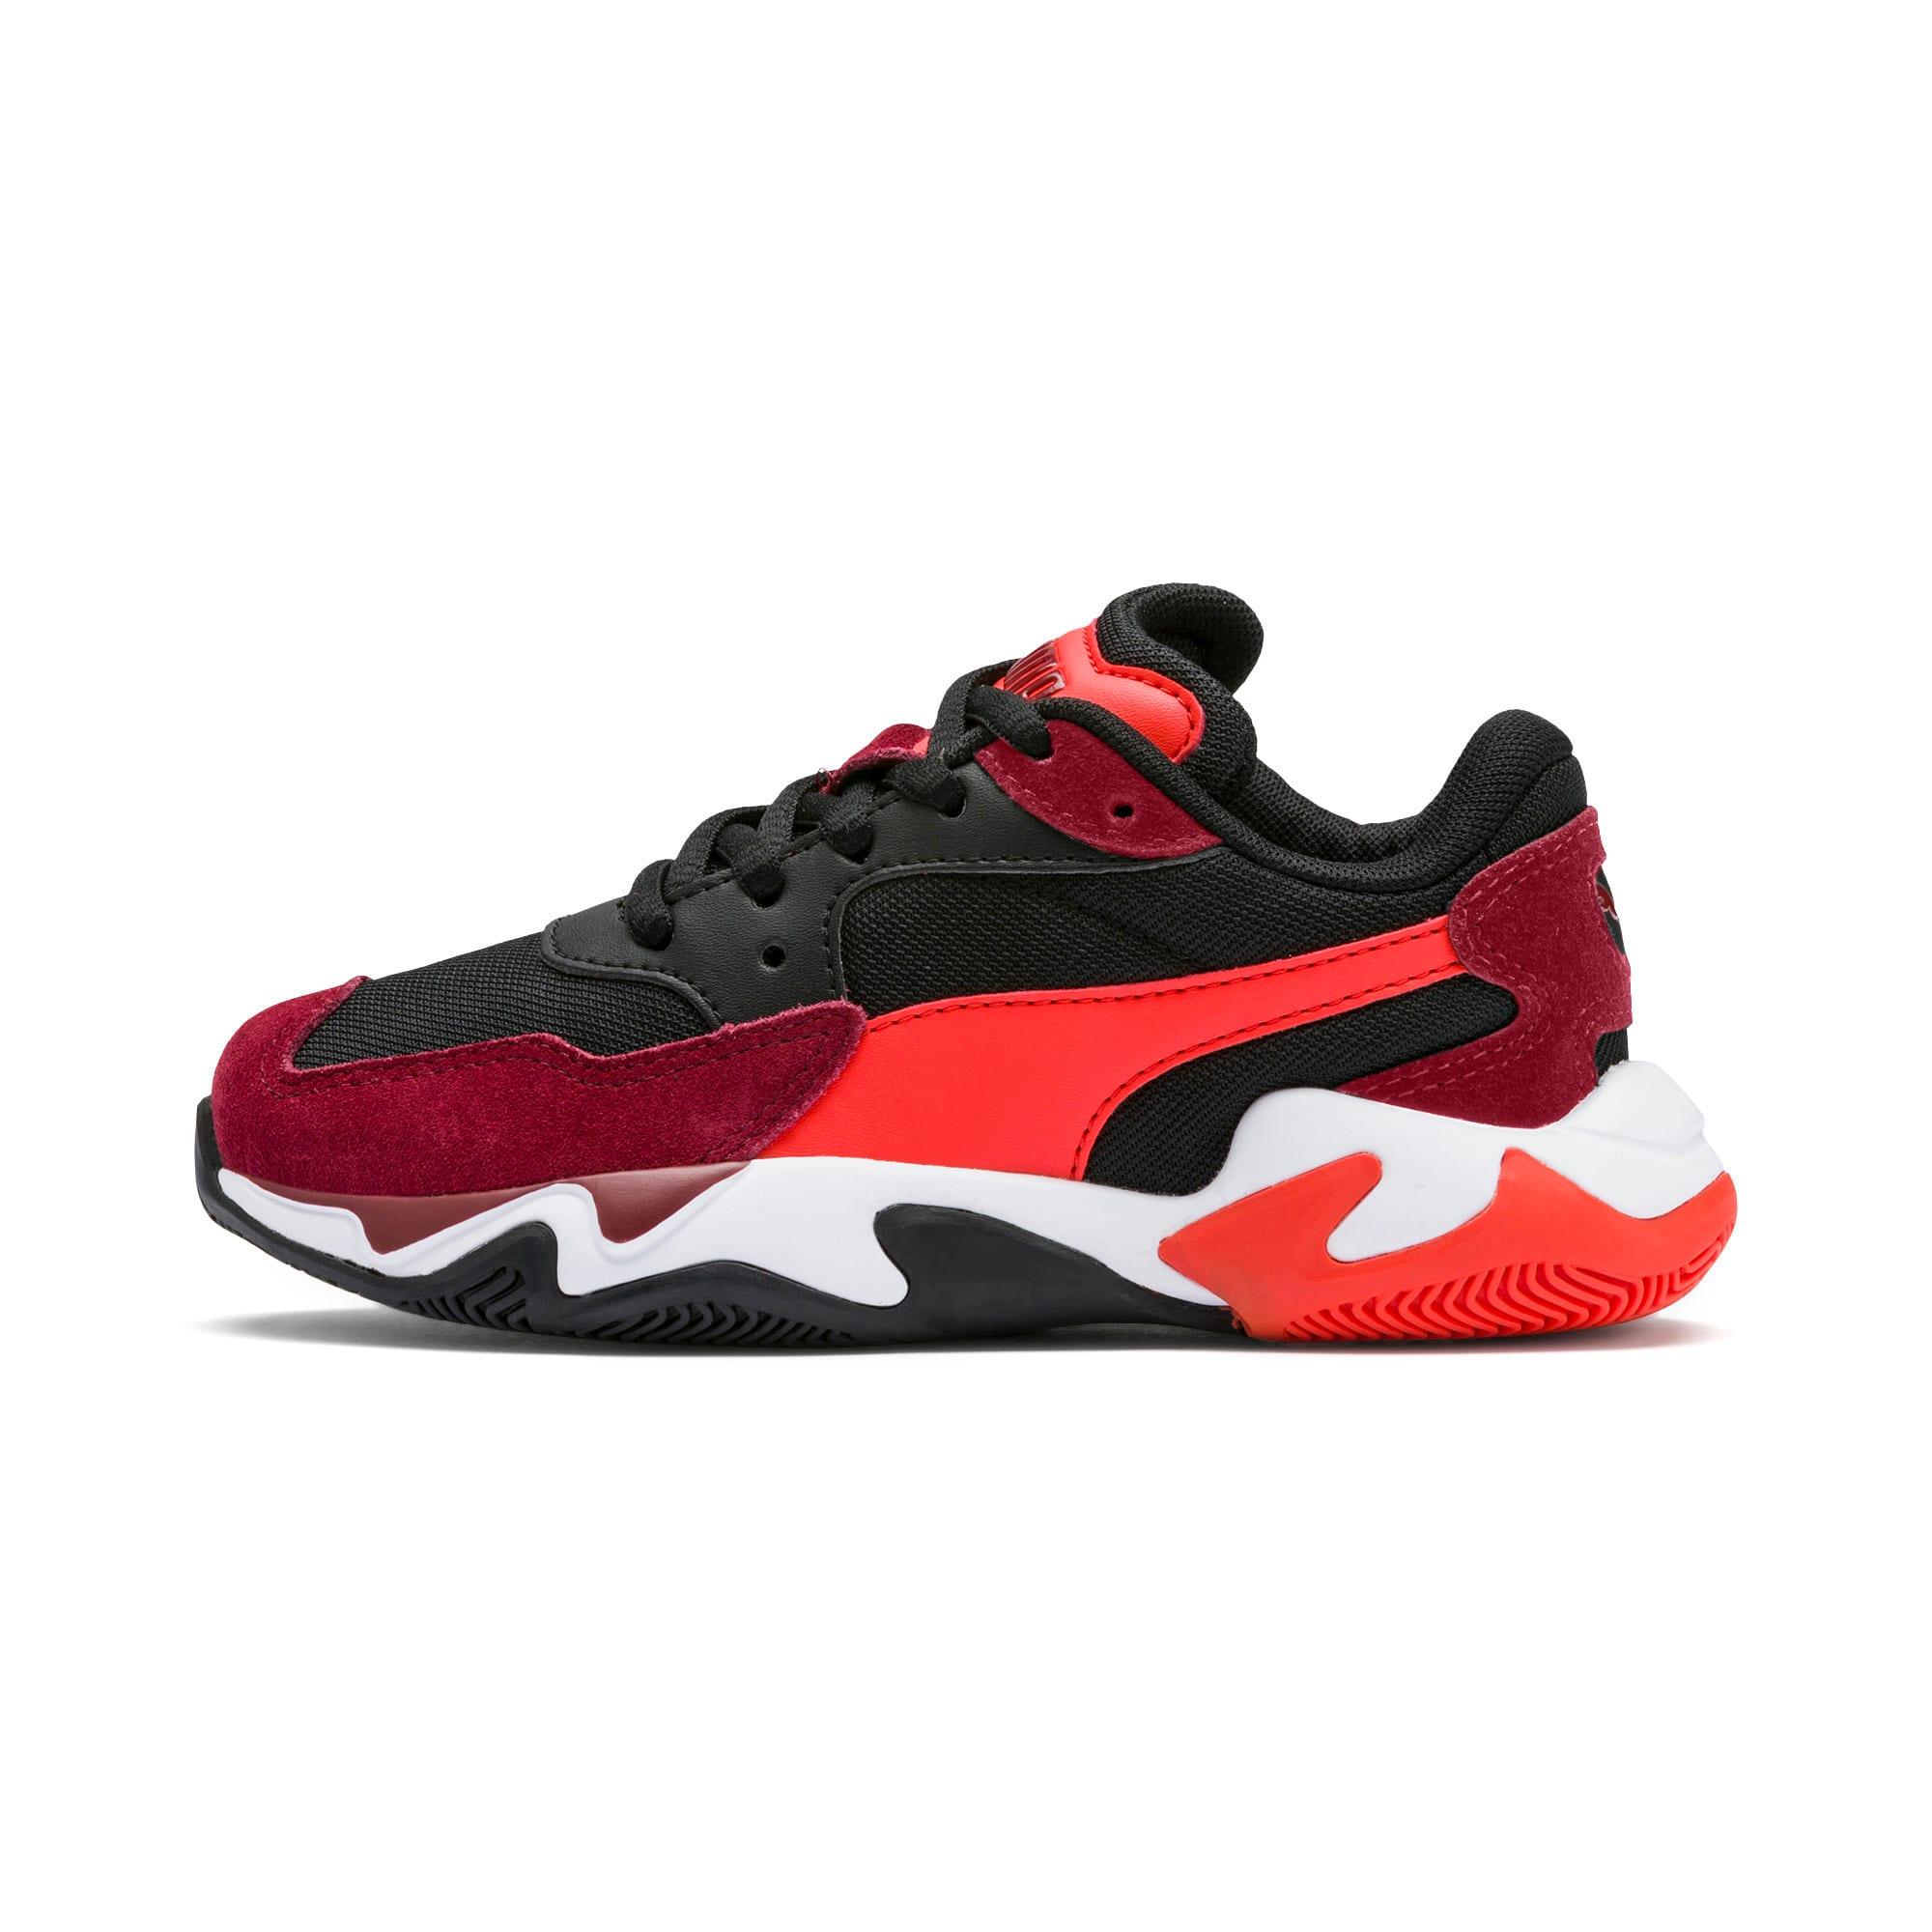 Miniatura 1 de Zapatos Storm Ray para niño pequeño, Rhubarb-Puma Black, mediano